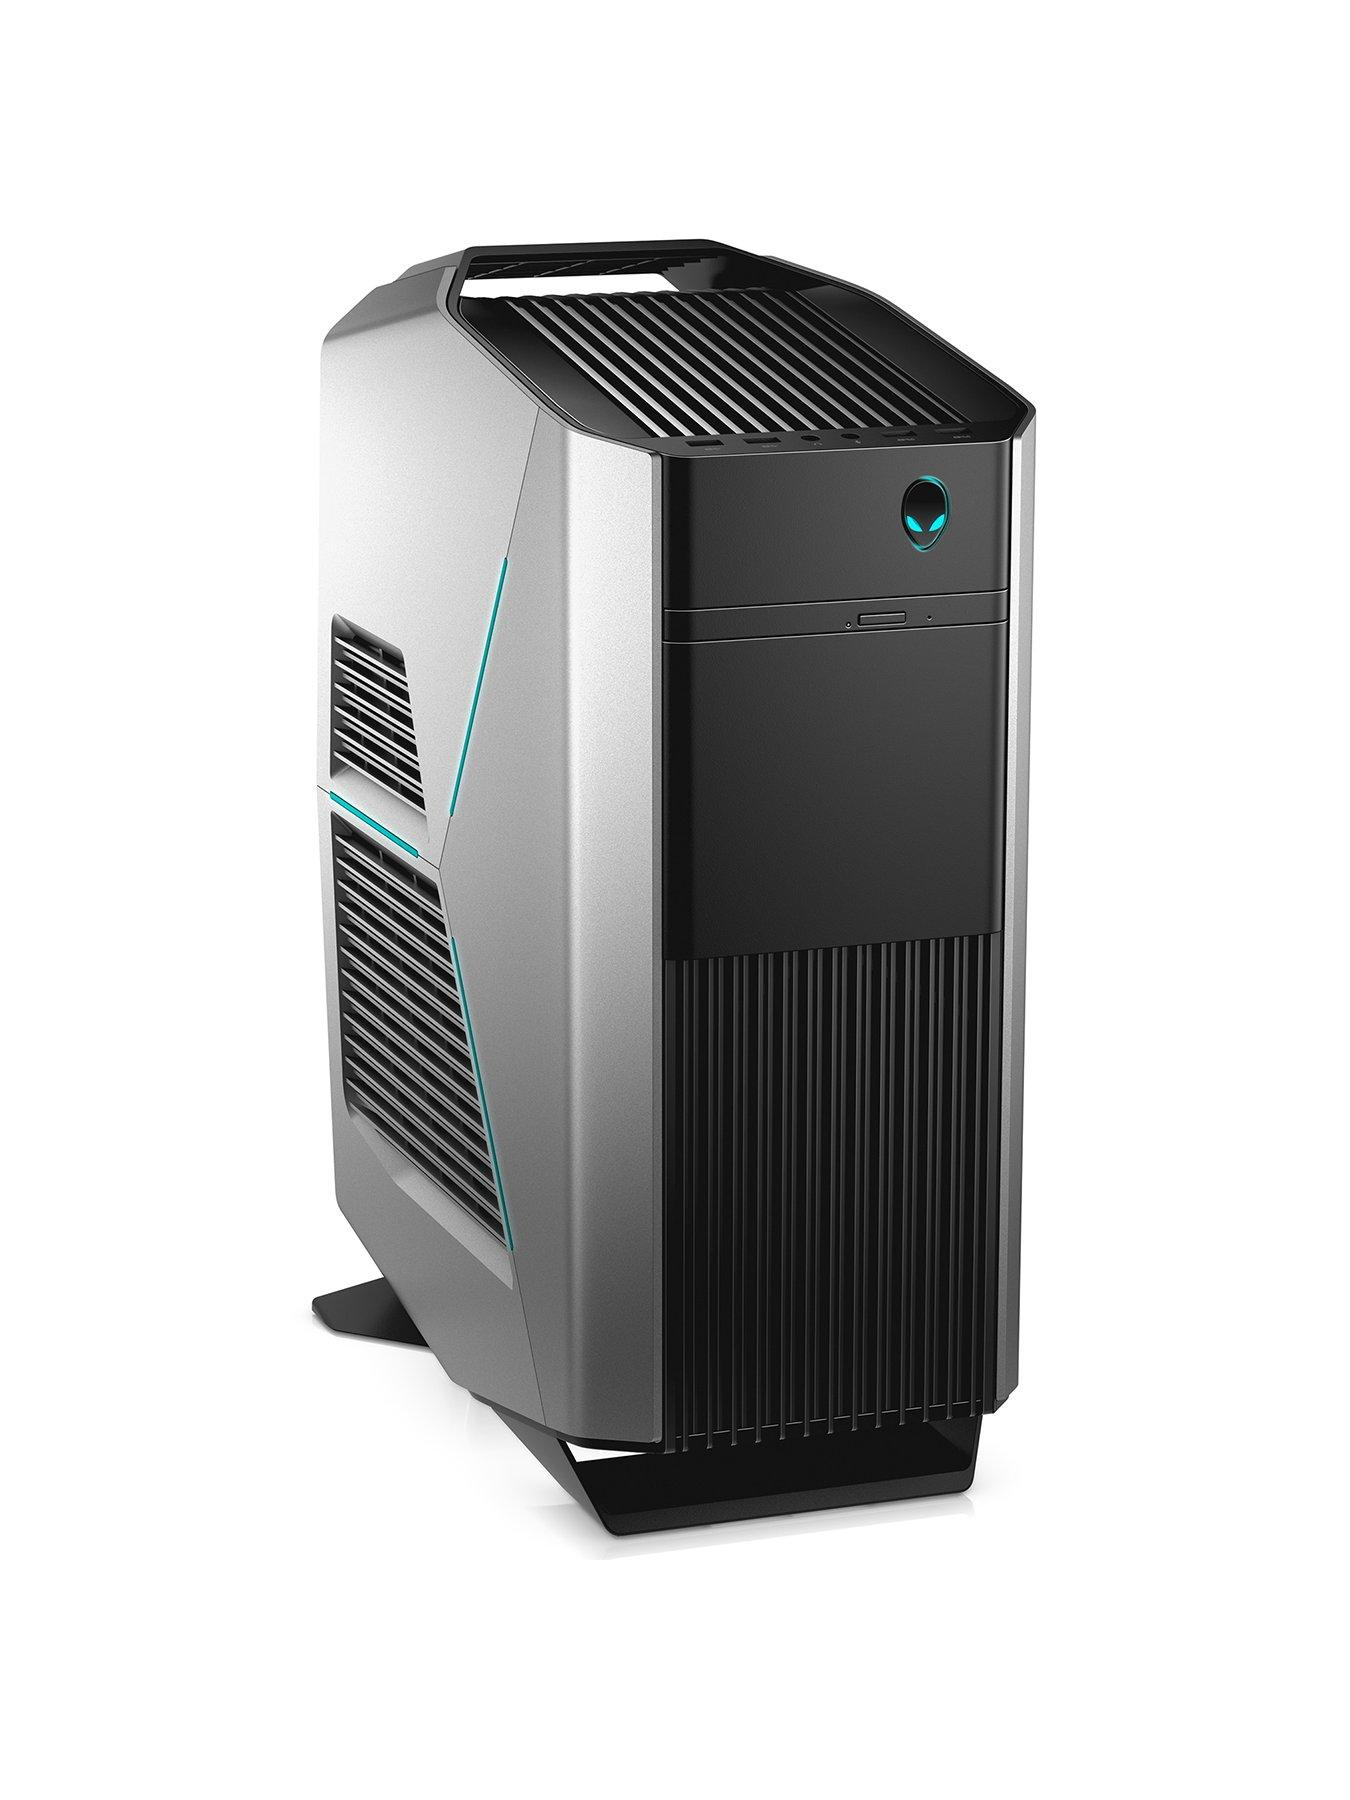 Alienware Aurora R7, Intel® Core™ i7-8700 Processor, 16GbDDR4 RAM, 1TbHDD & 16GbIntel® Optane™, Gaming PC with 8GbNVIDIA GeForce GTX 1070 Graphics